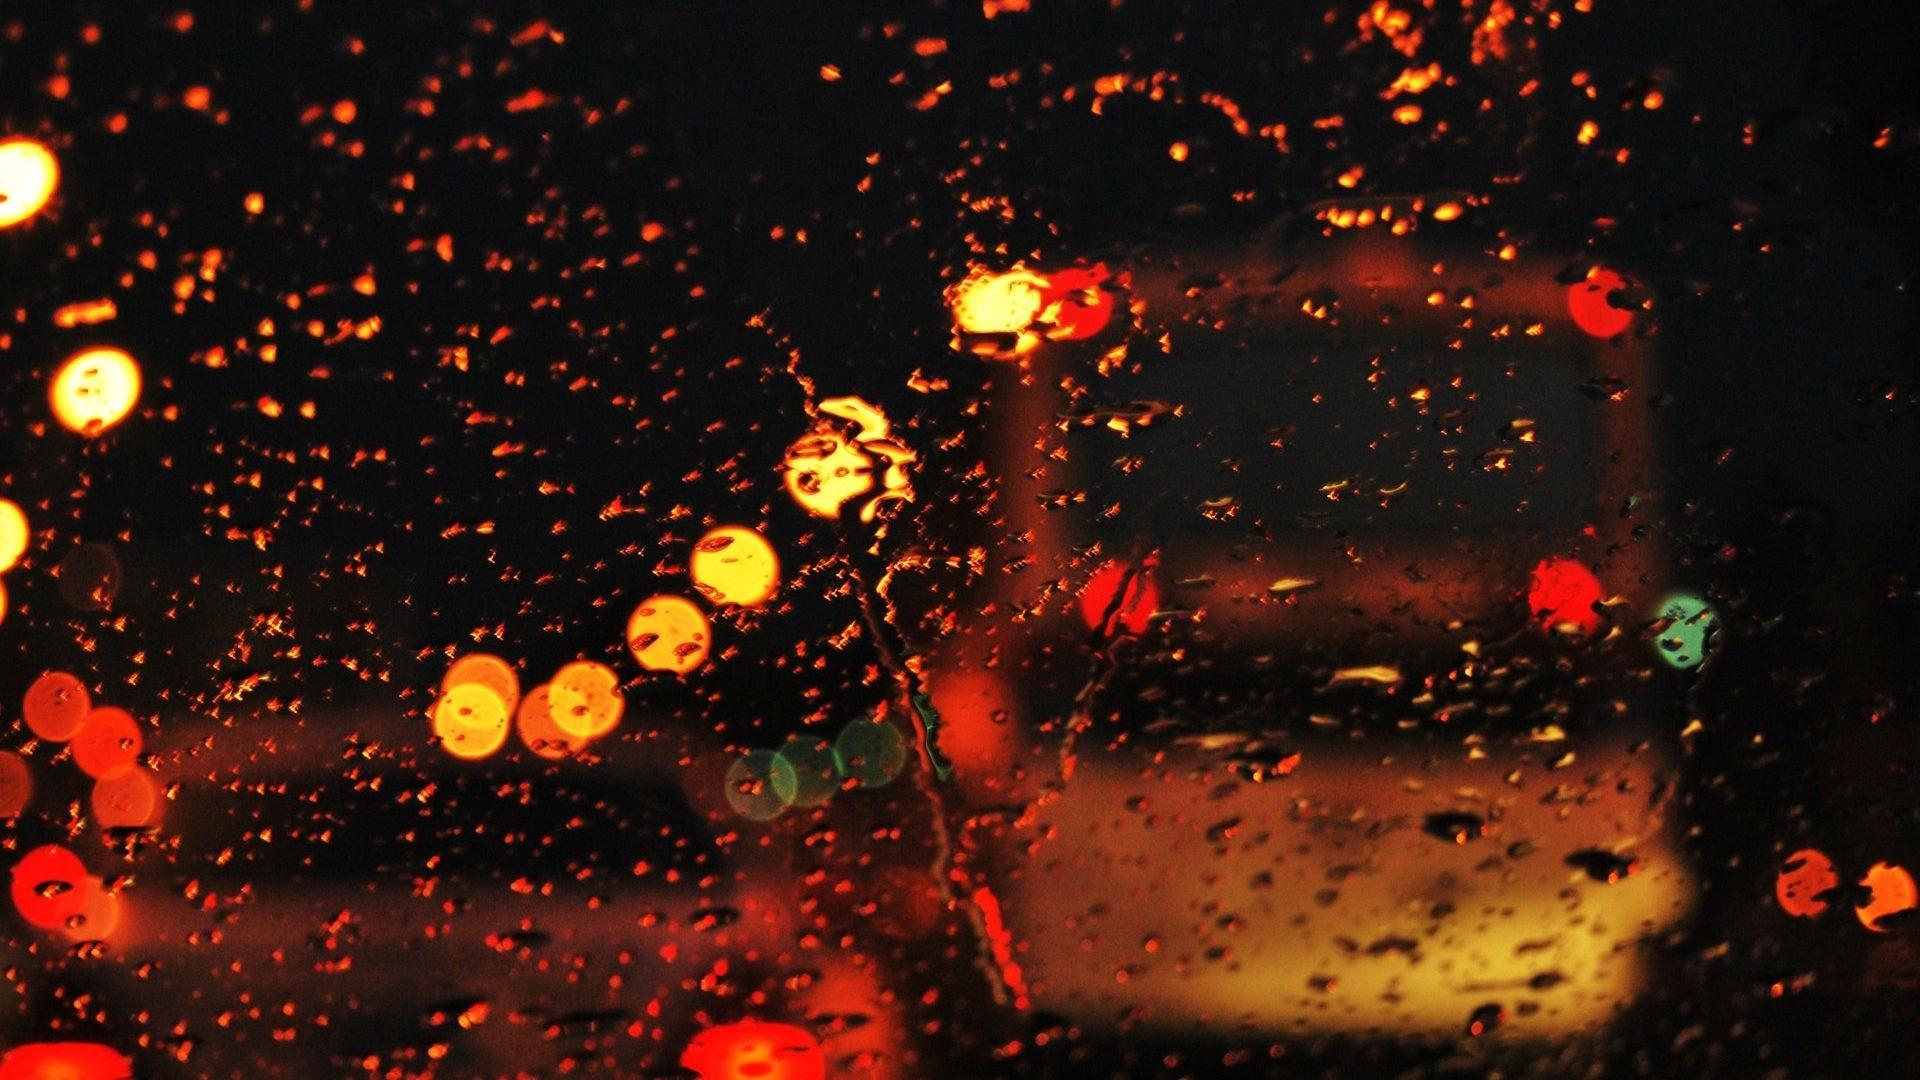 Dark Tag – Vehicles Rain Water Cars Colors Drops Lights Photography Dark  Traffic Beautiful Nature Desktop